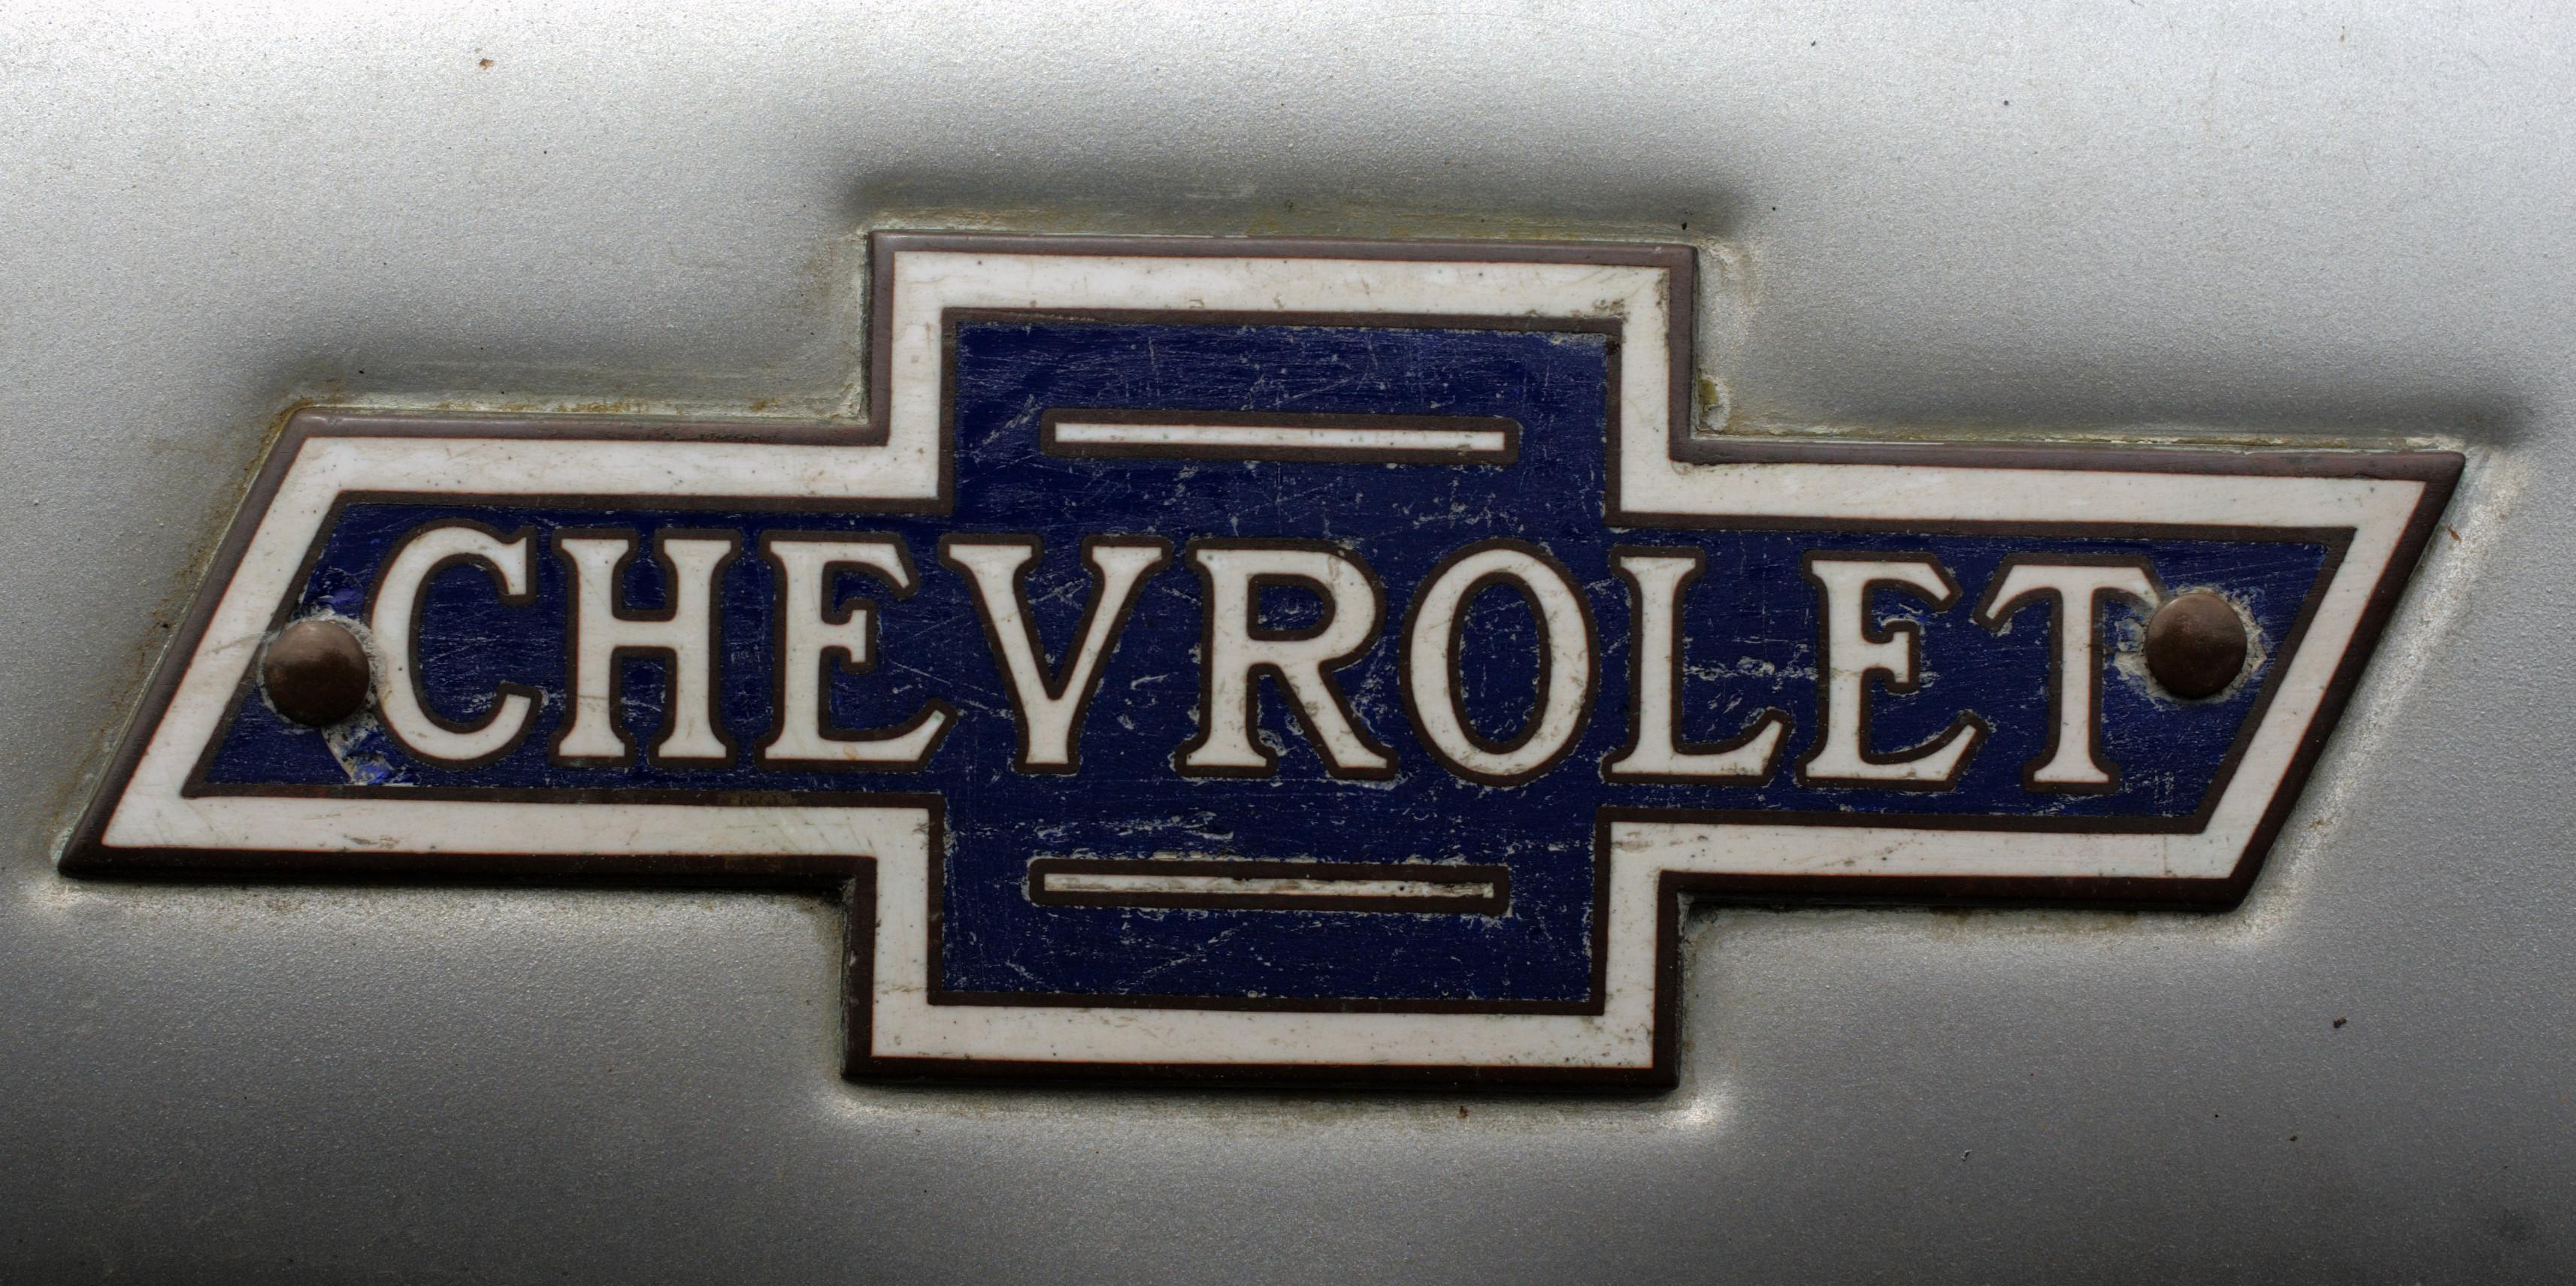 chevrolet logo. filechevrolet logo bluejpg chevrolet t